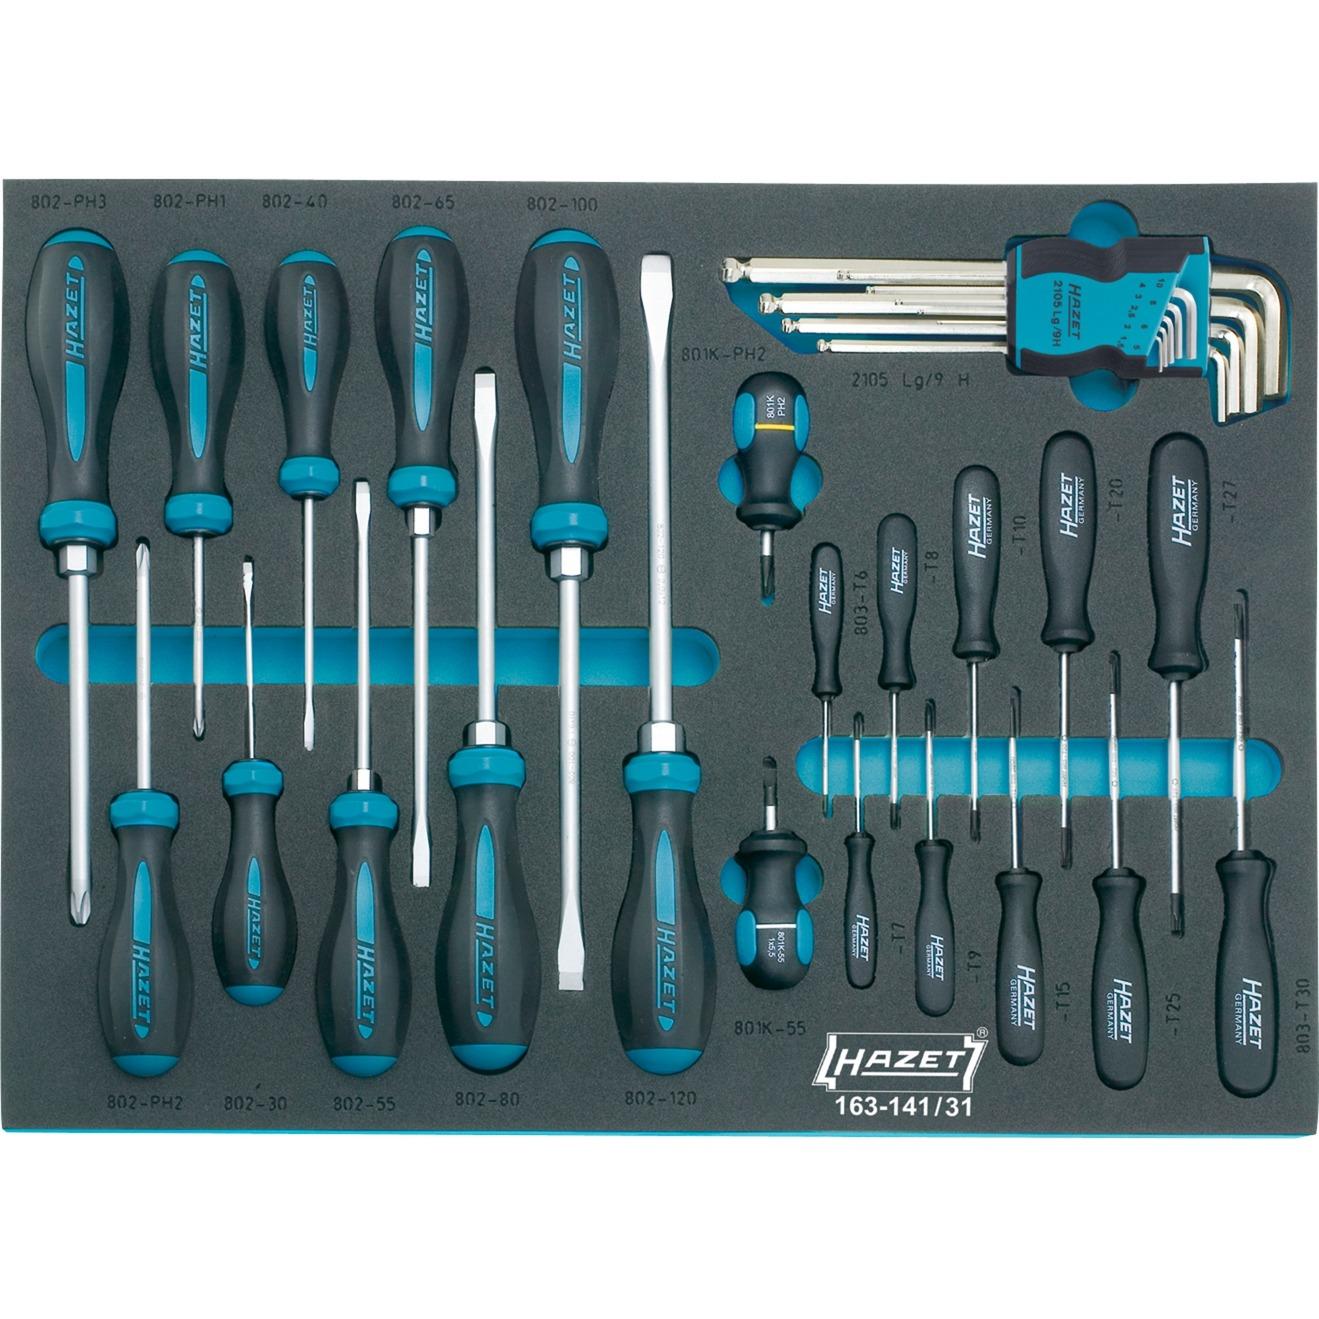 163-141/31, Kit de herramientas